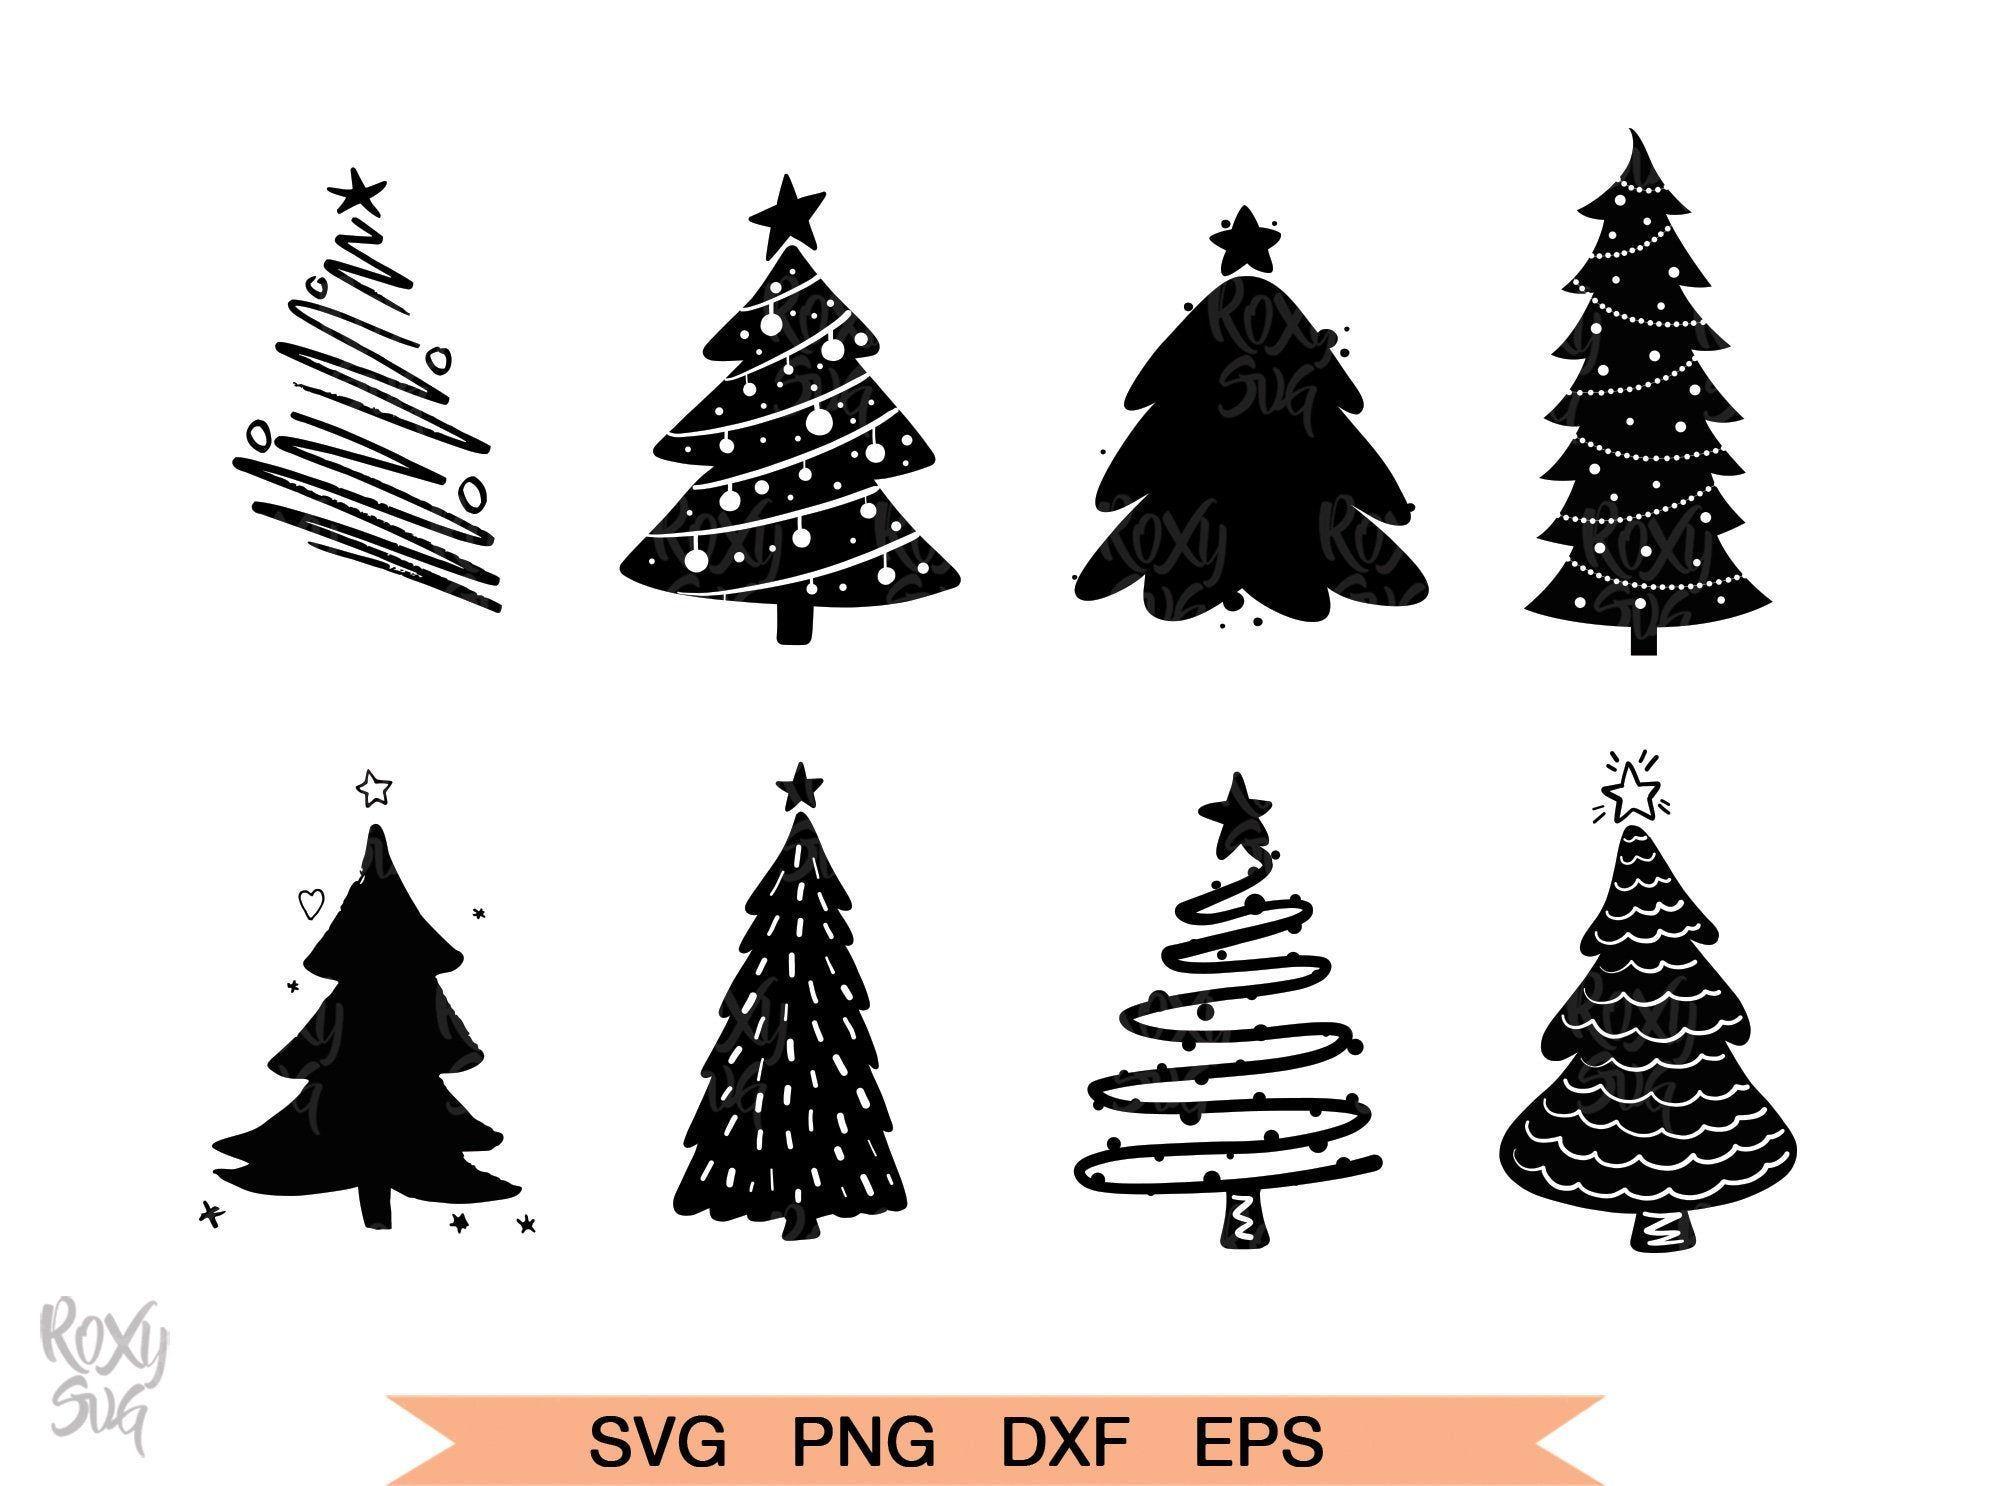 Download Christmas Trees Silhouette Christmas Tree Silhouette Tree Silhouette Cartoon Christmas Tree